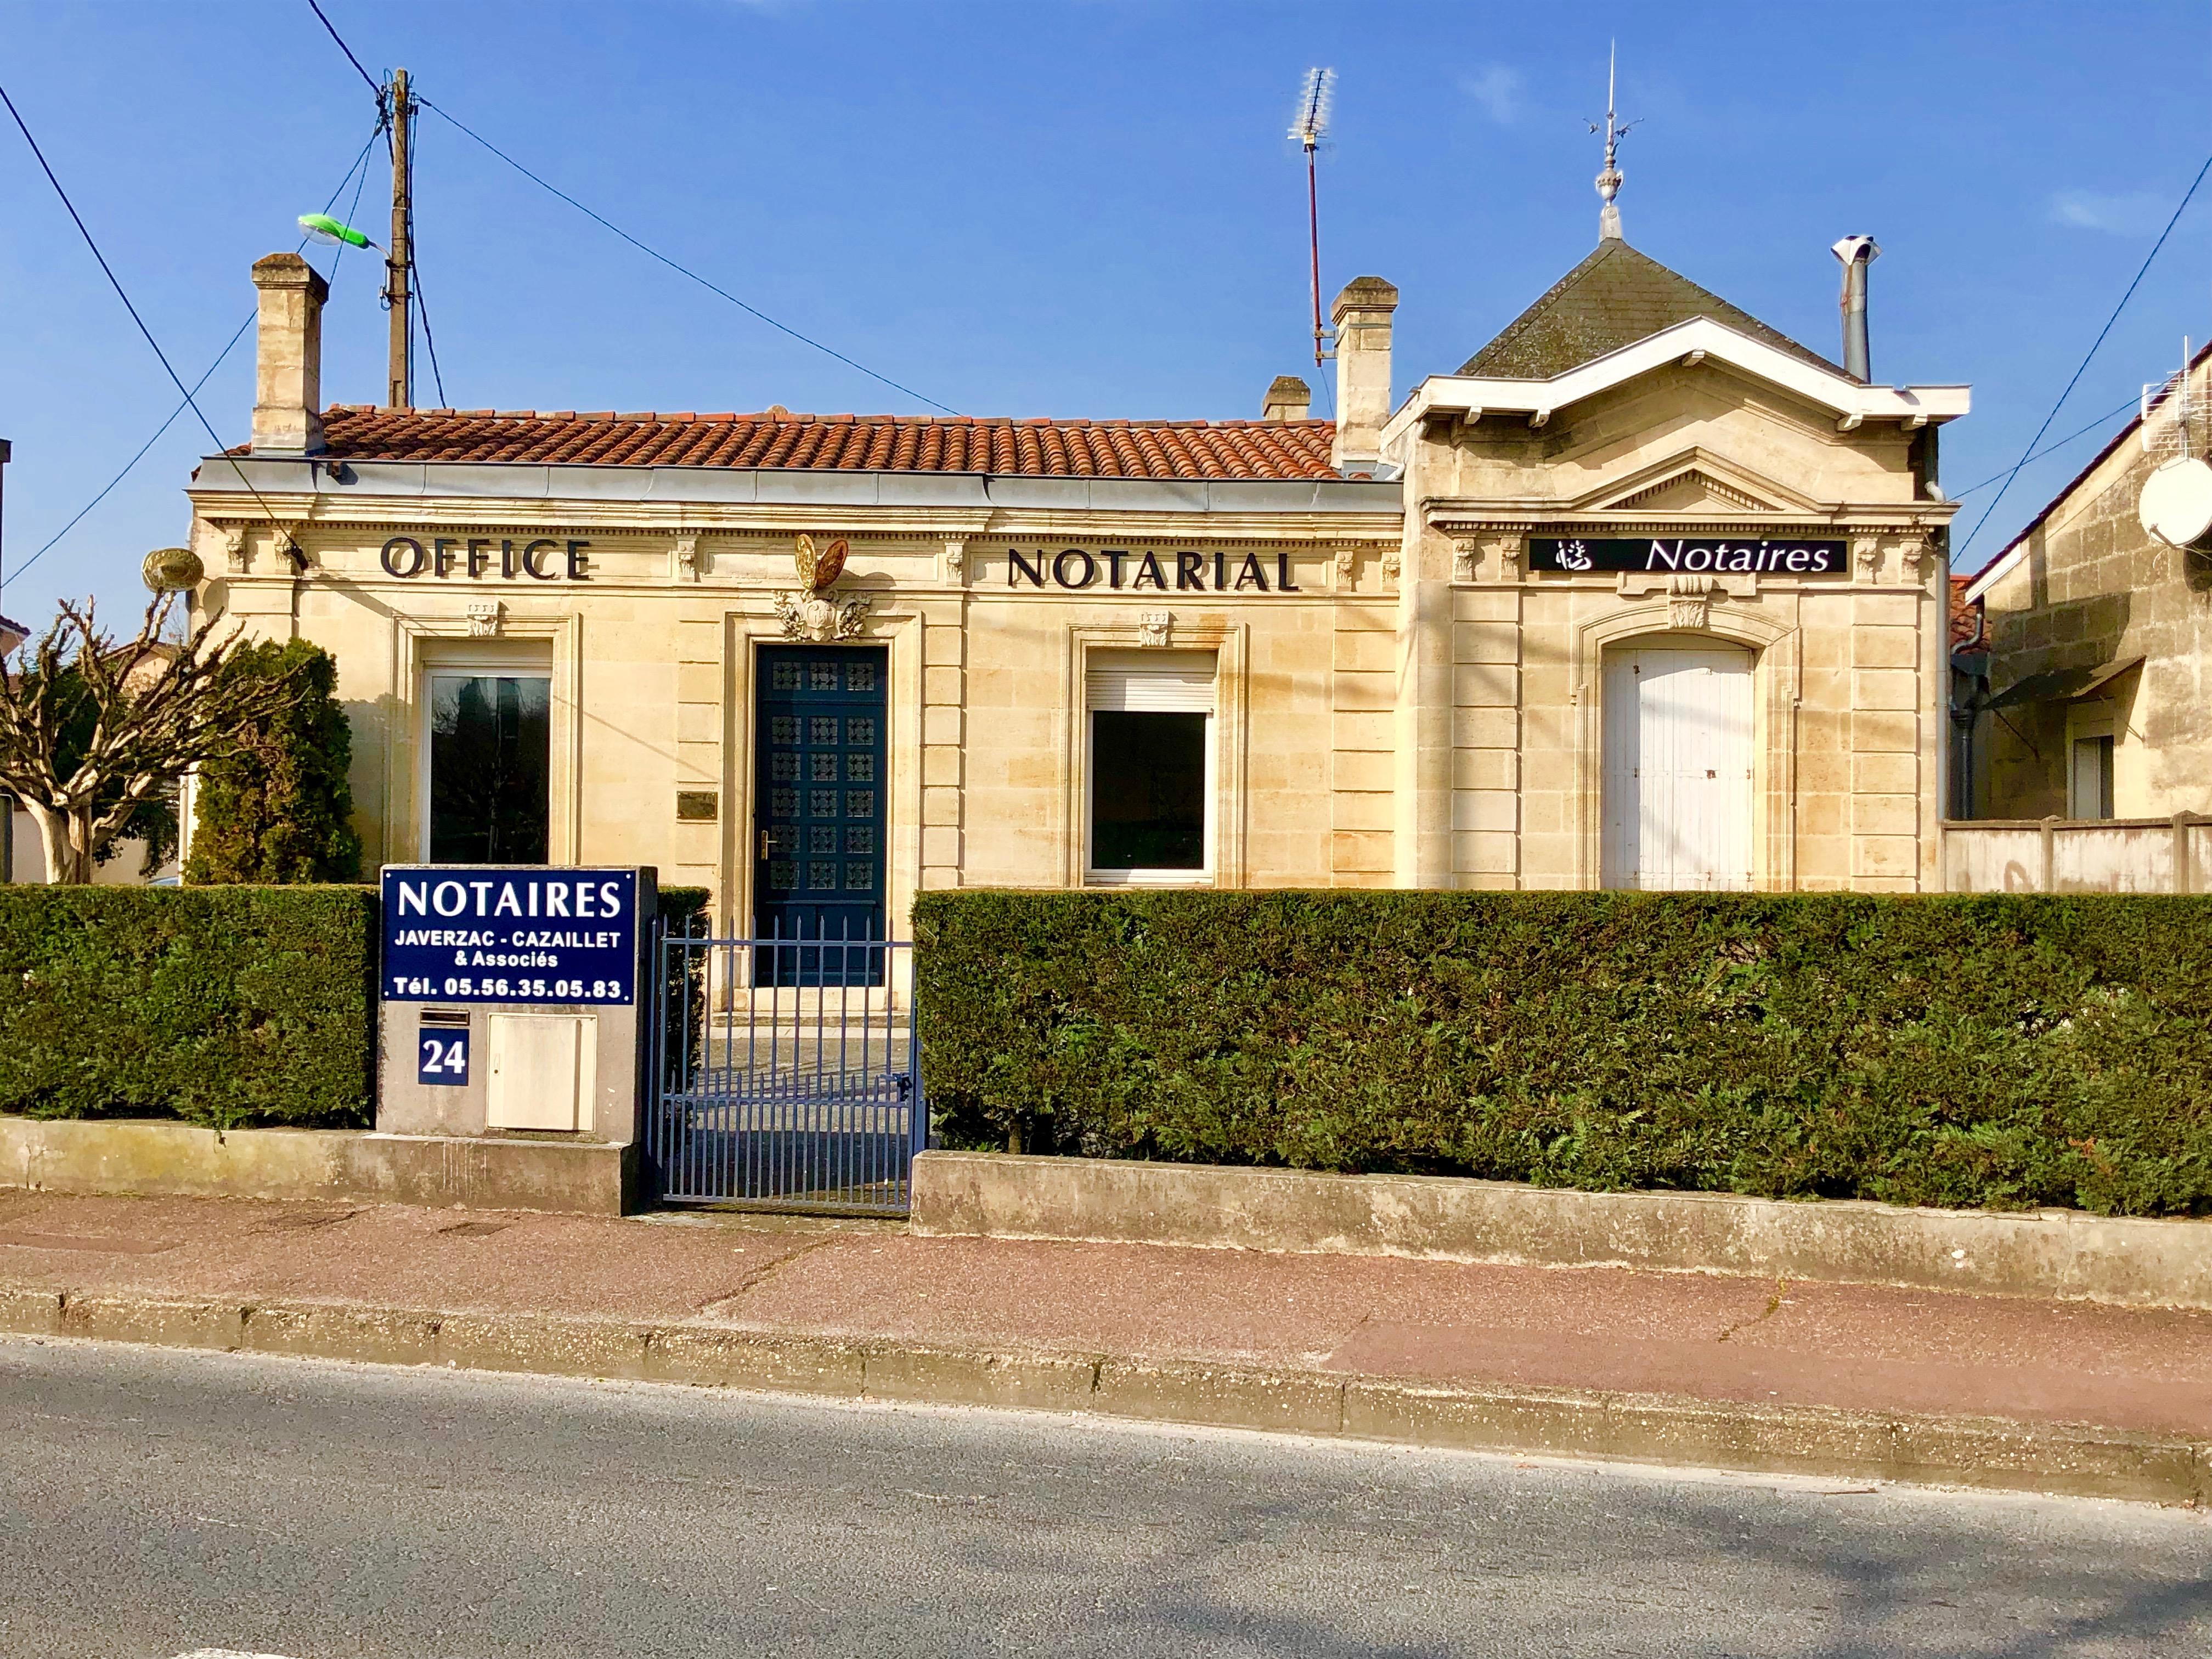 Notaire Blanquefort JAVERZAC CAZAILLET immobilier succession vente